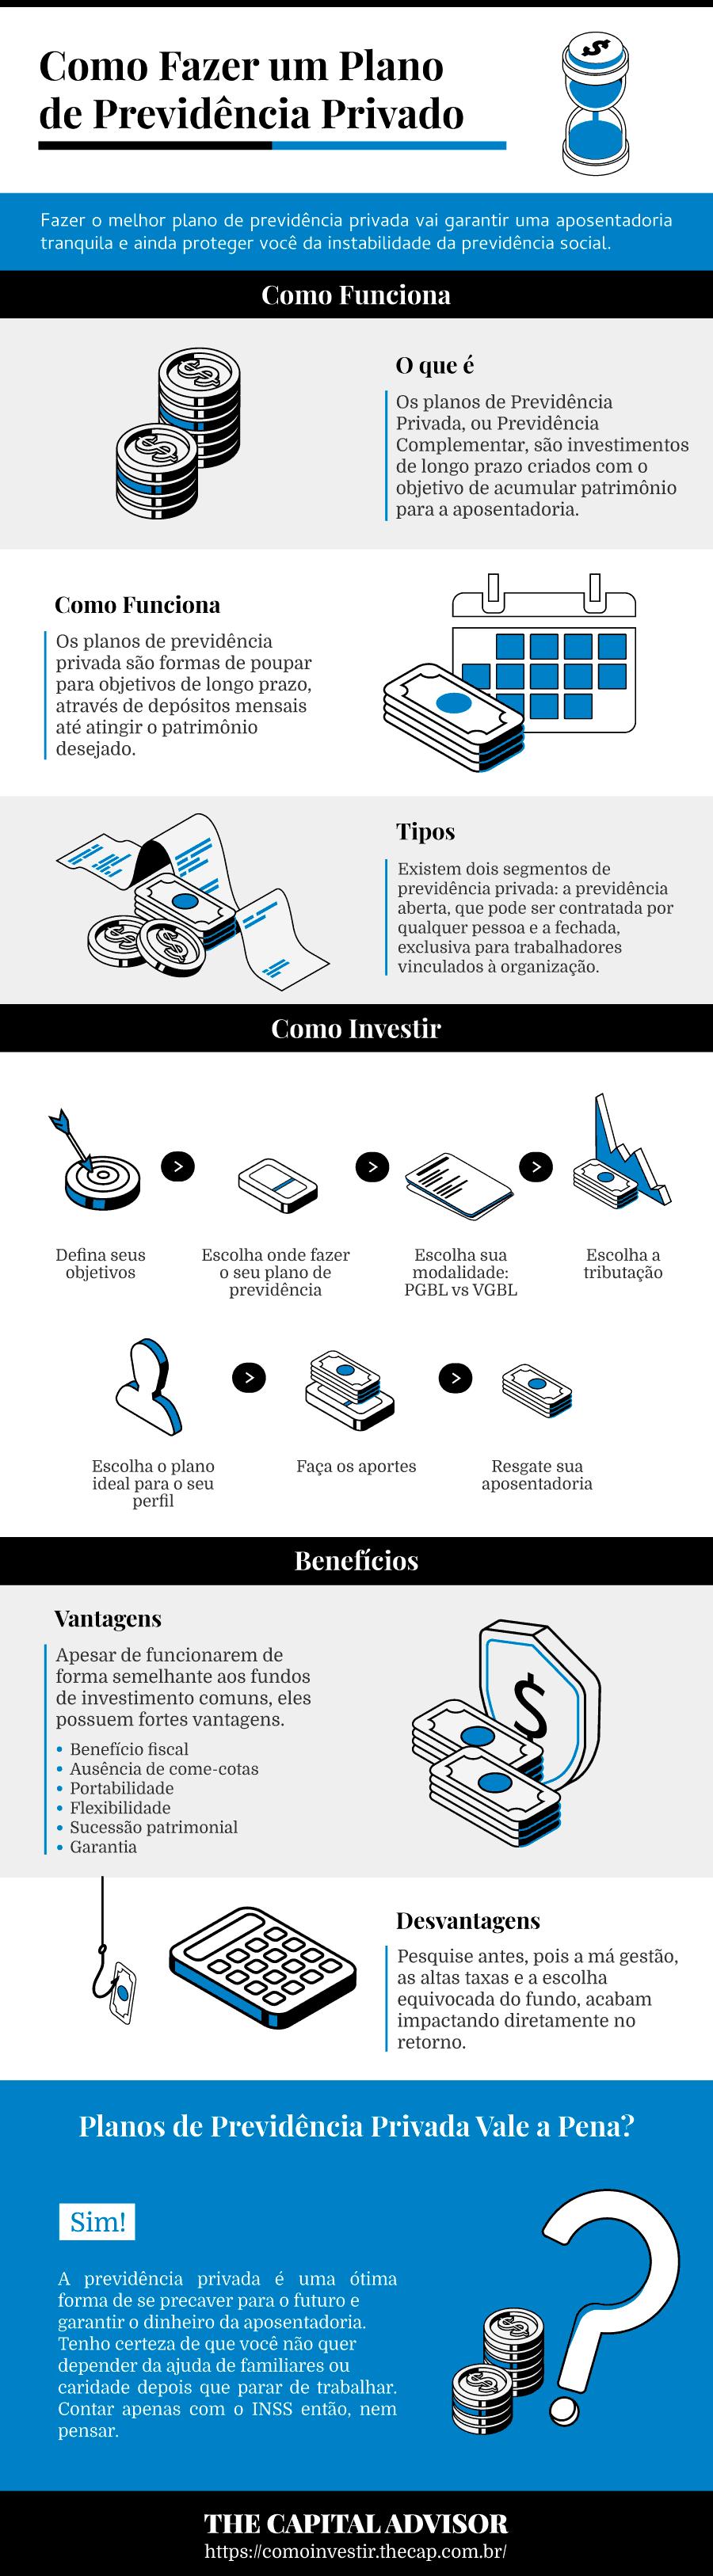 Como funciona a previdência privada